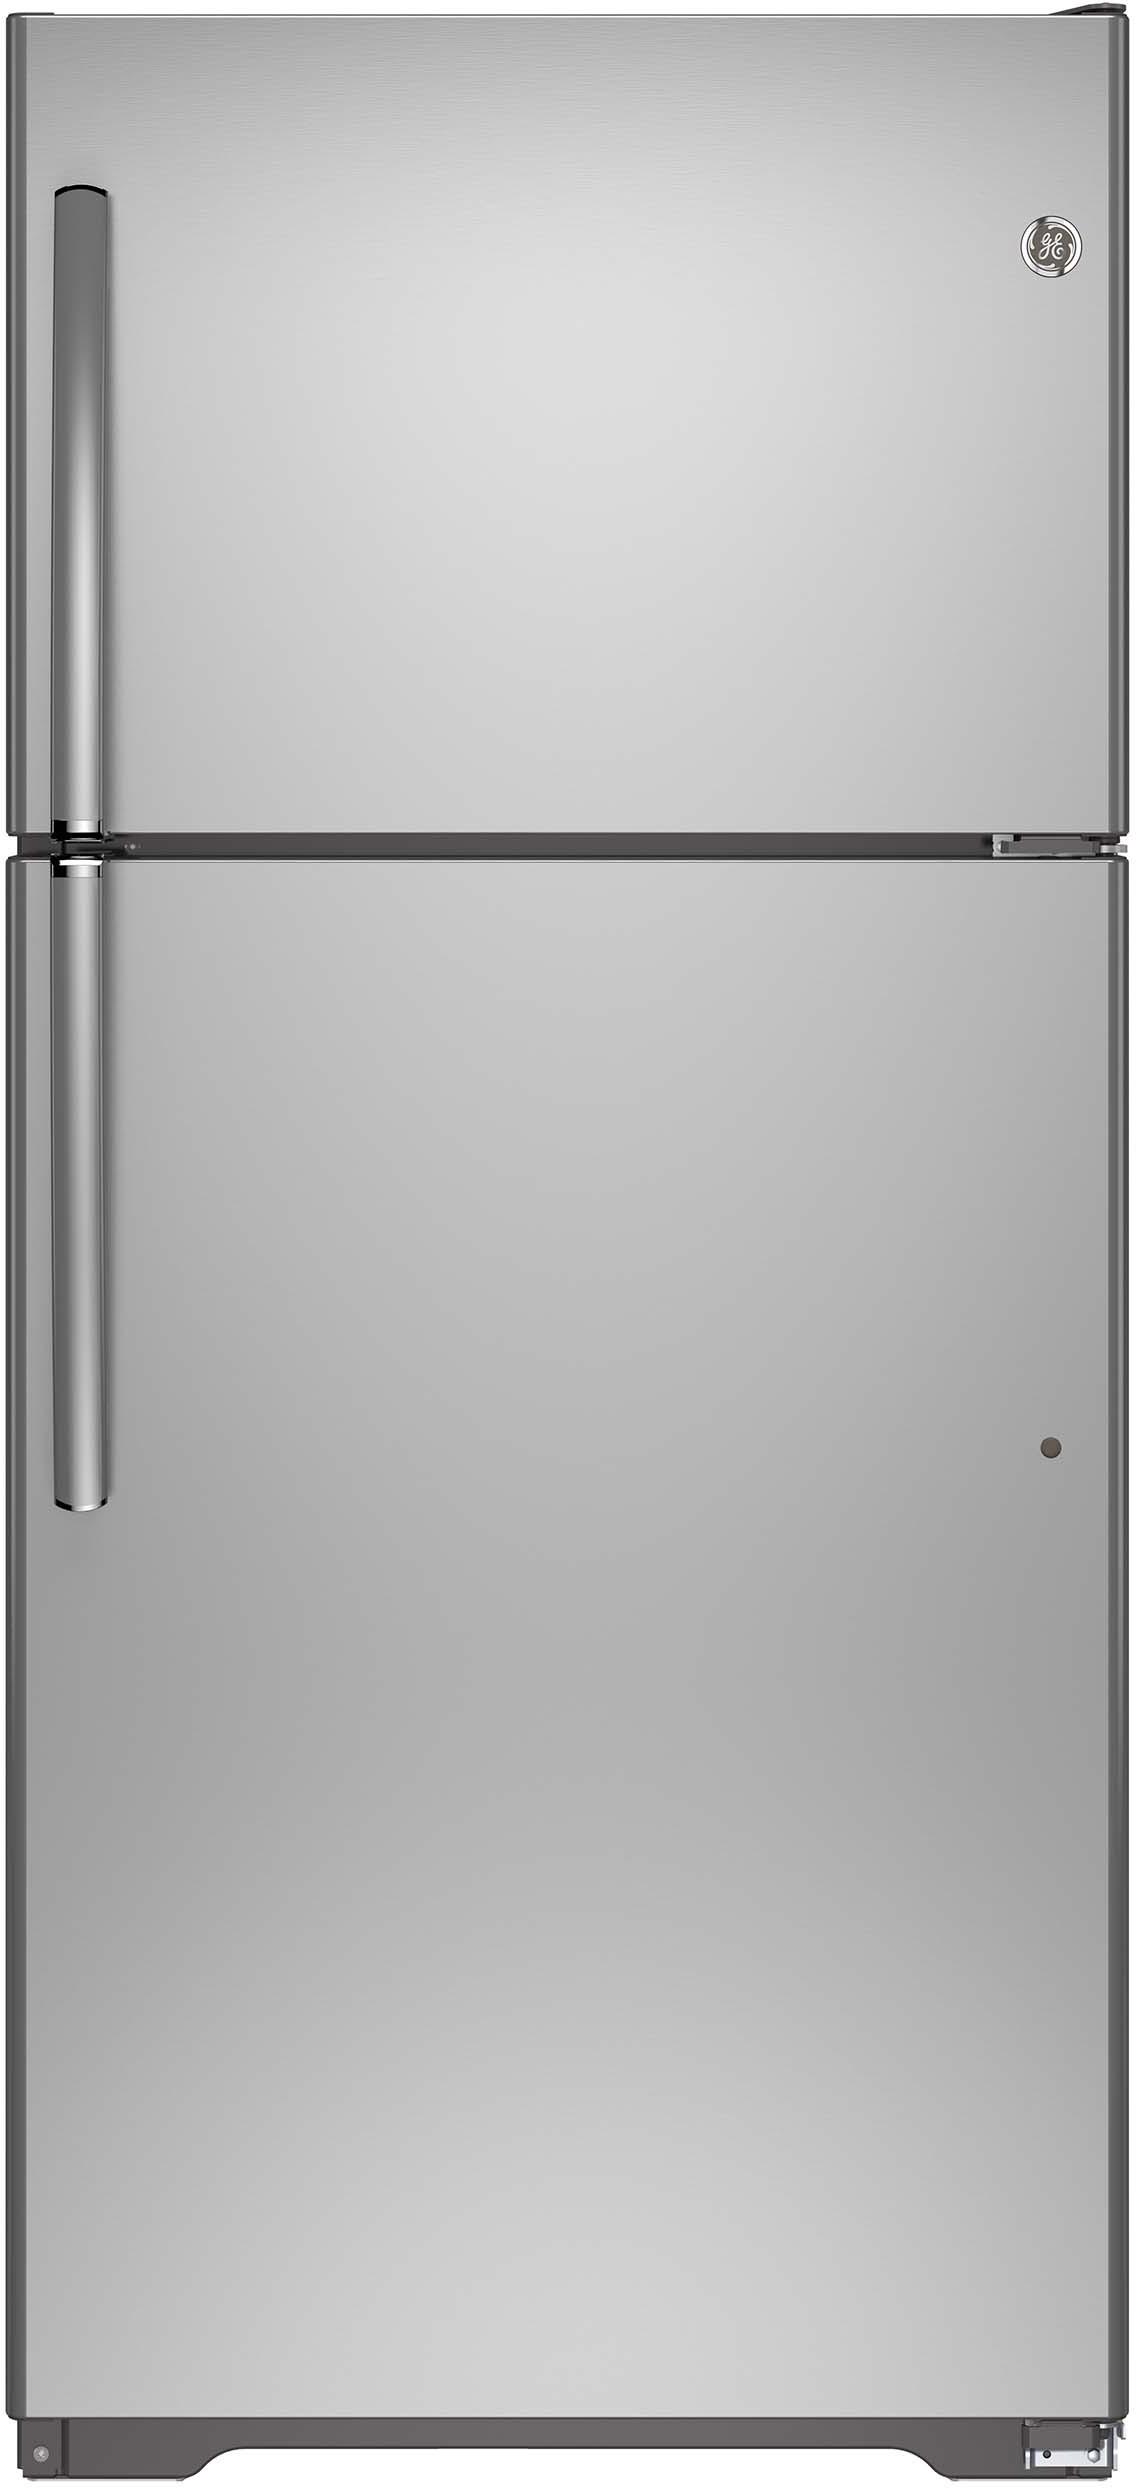 Ge Gie18ishss 30 Inch Top Freezer Refrigerator With 18 2